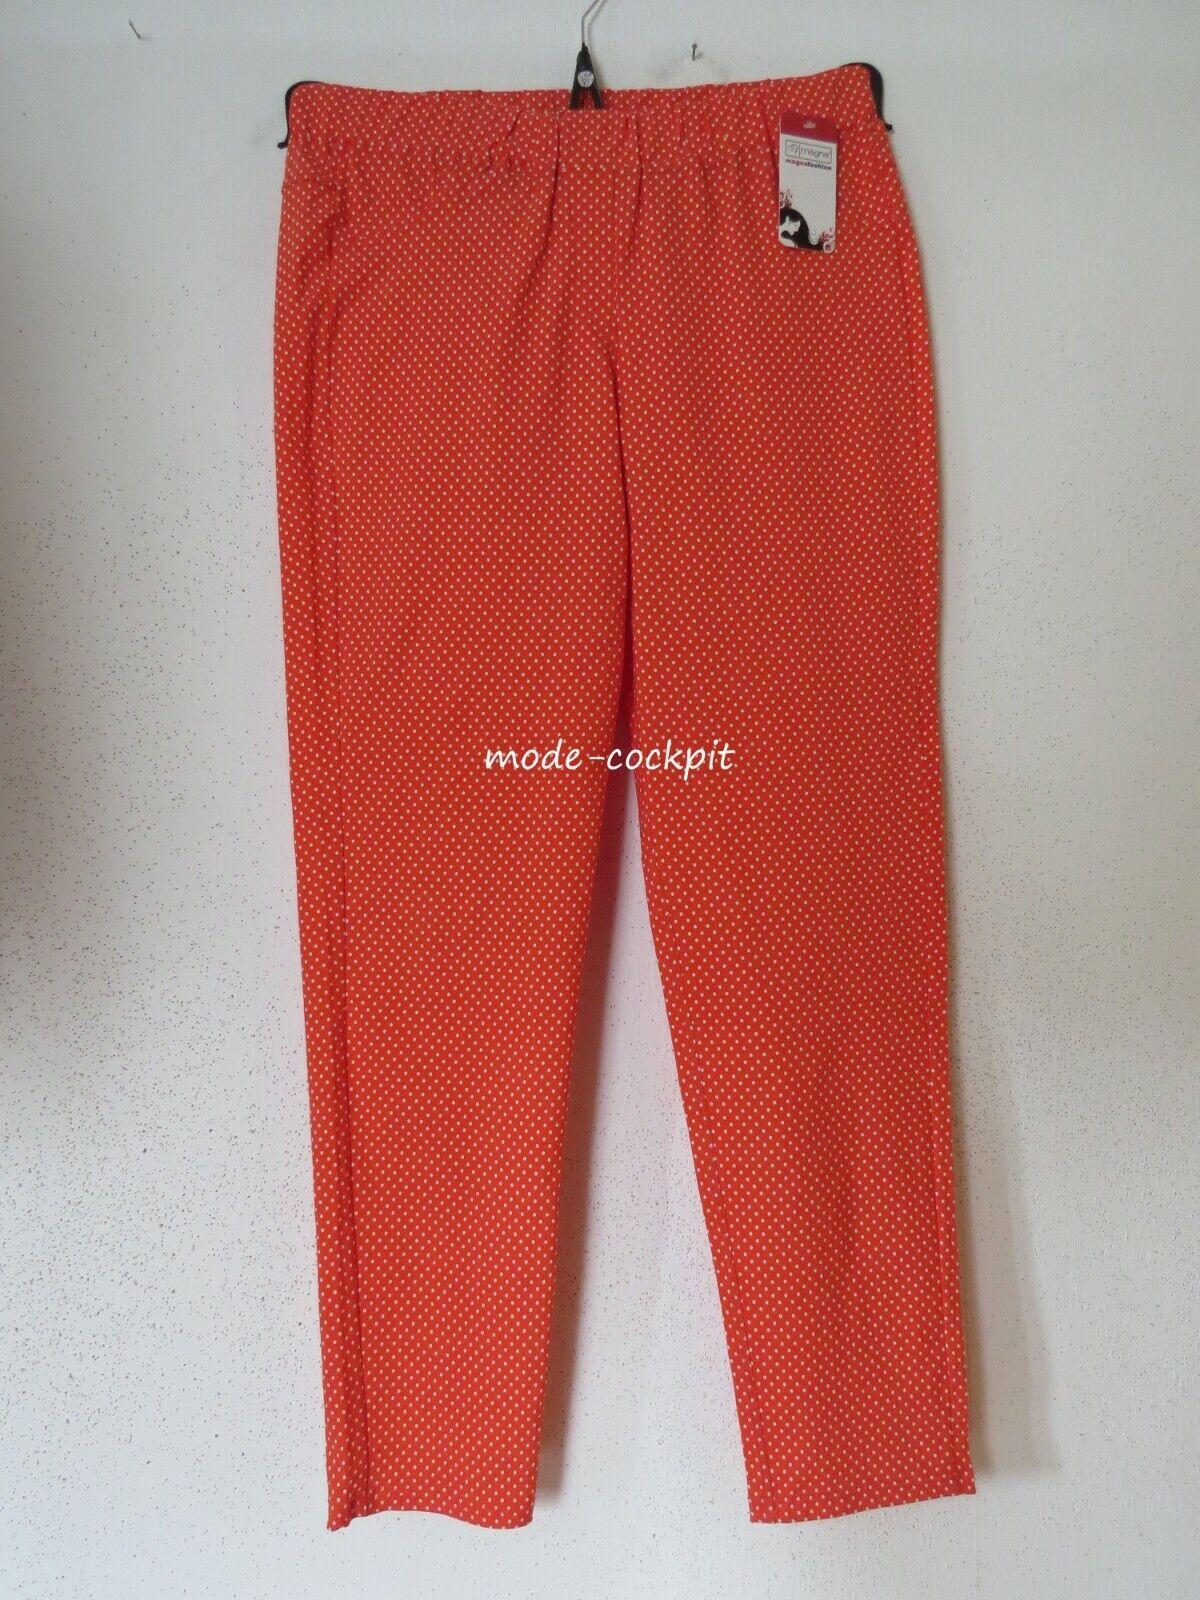 Magna Great Stretch Slip Hose Layerot Look New Coral Polka-Dot 52-54